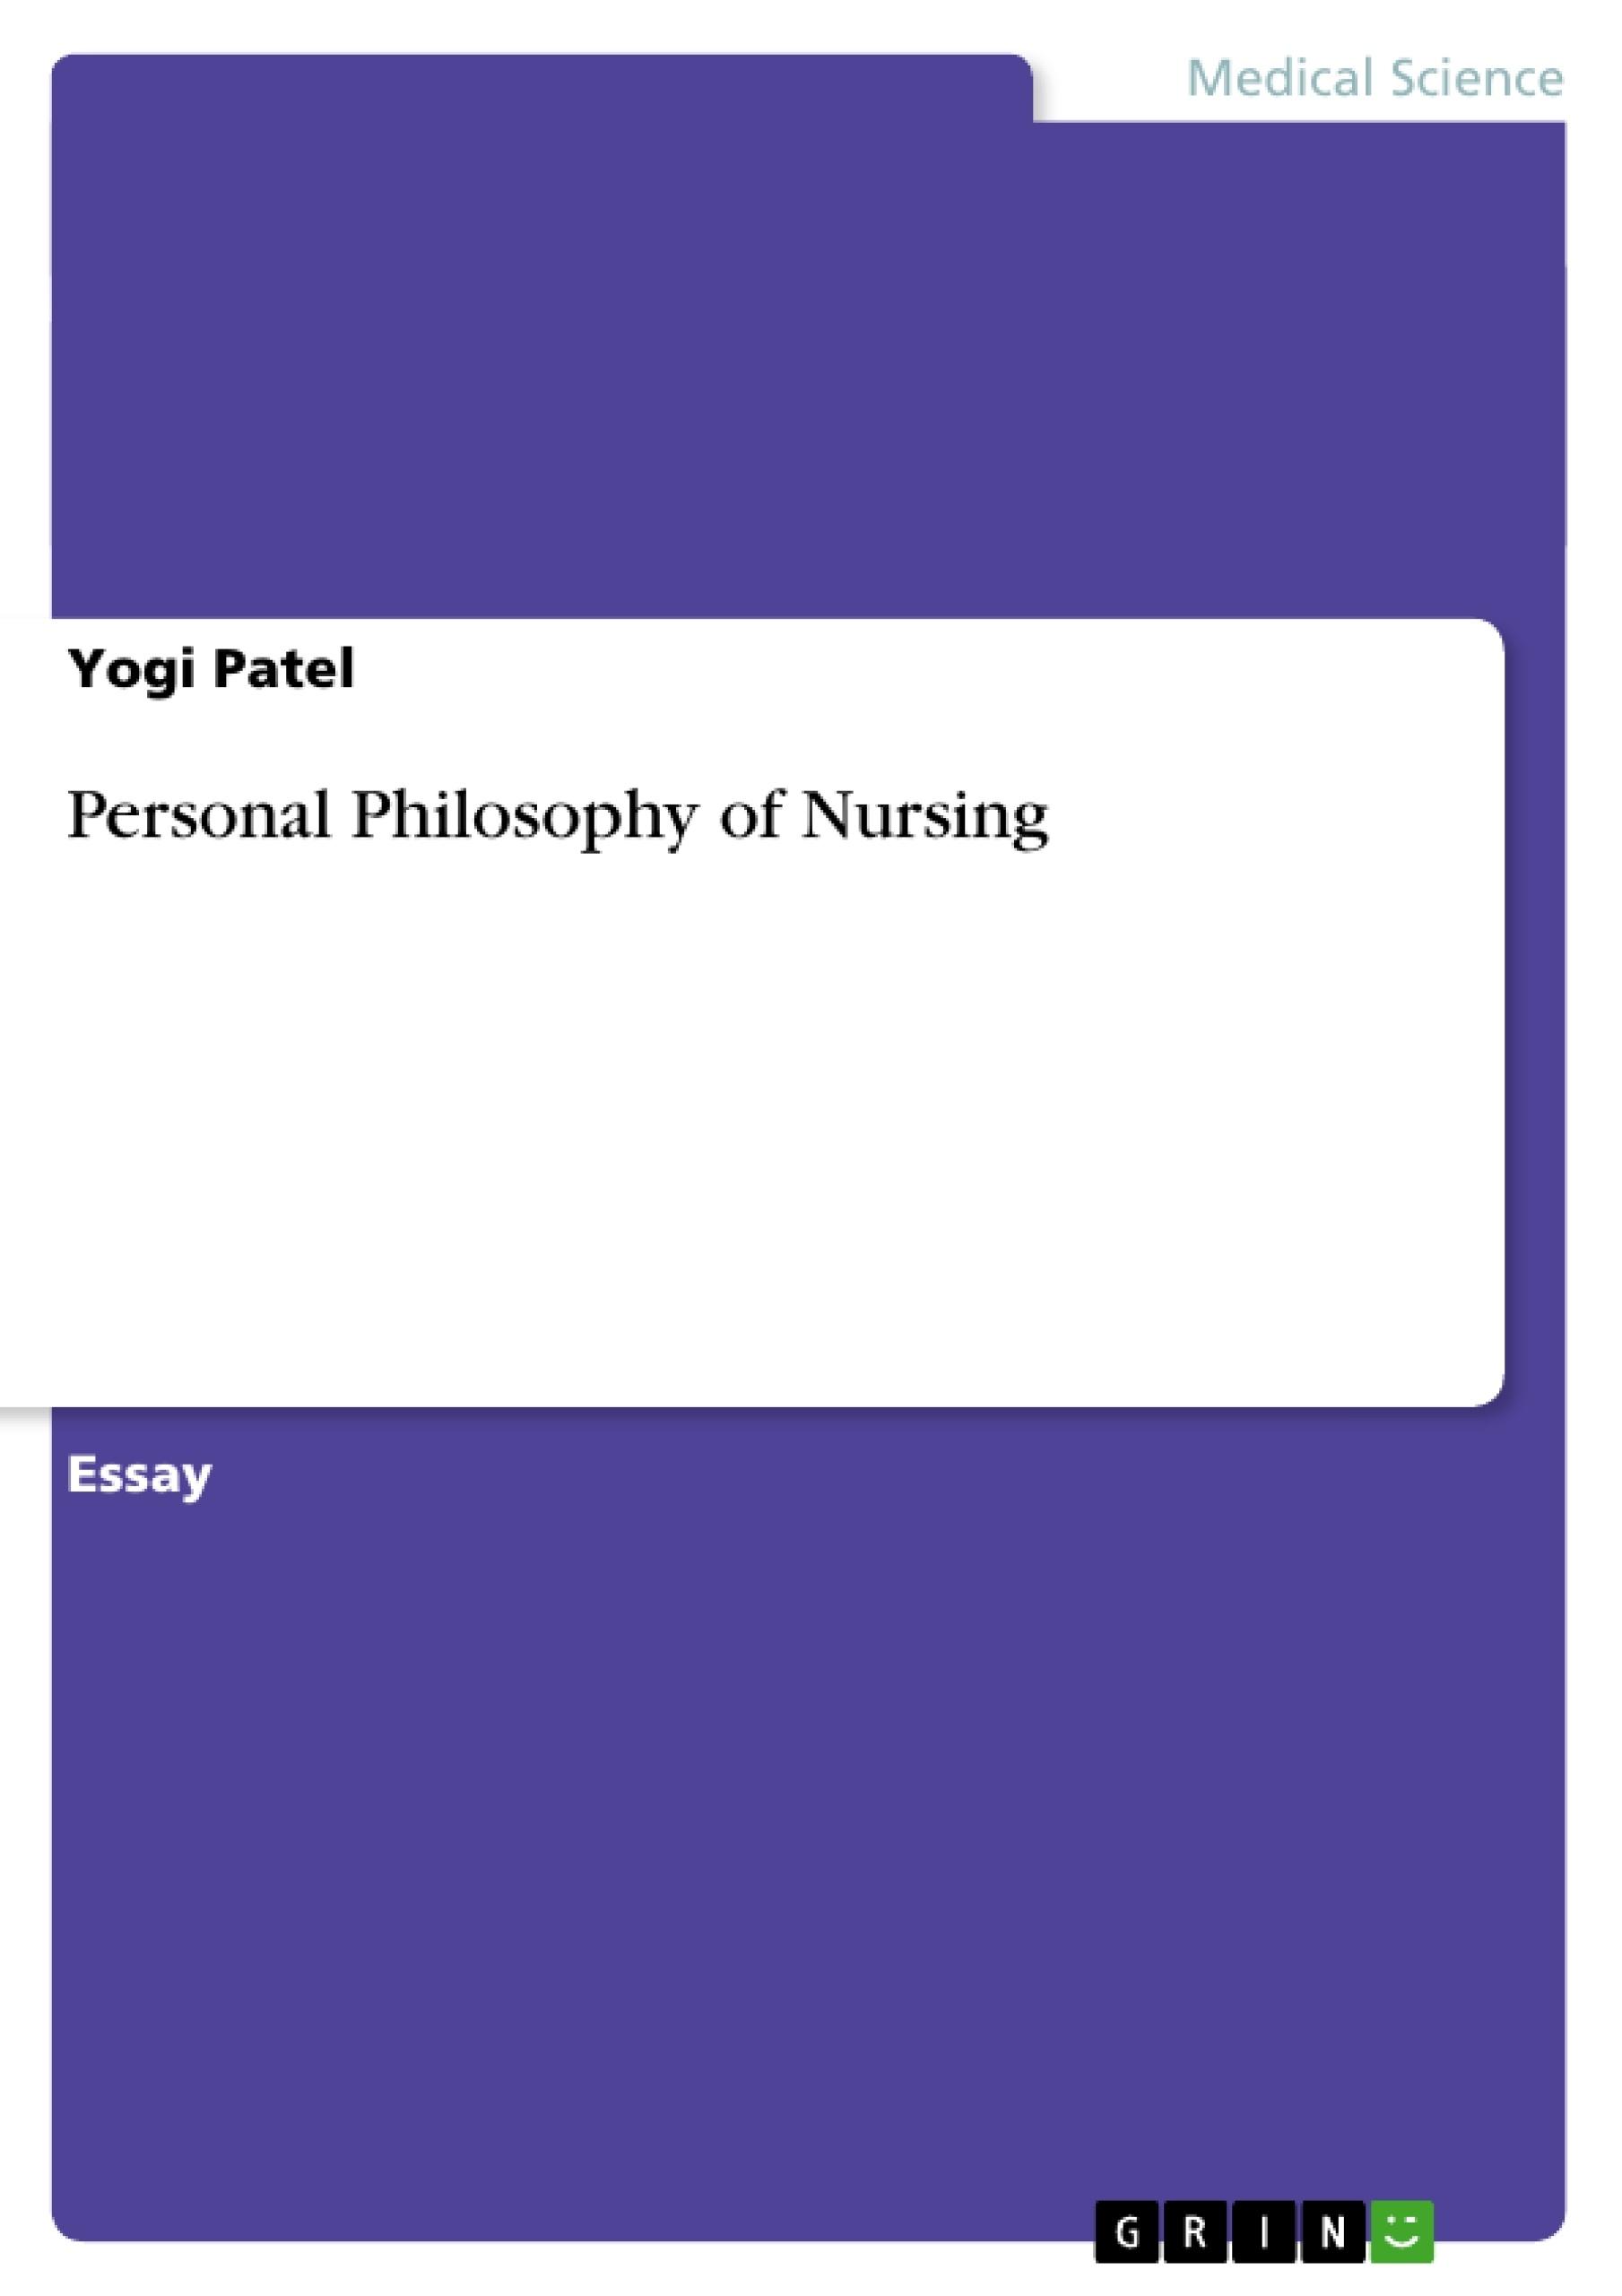 Title: Personal Philosophy of Nursing